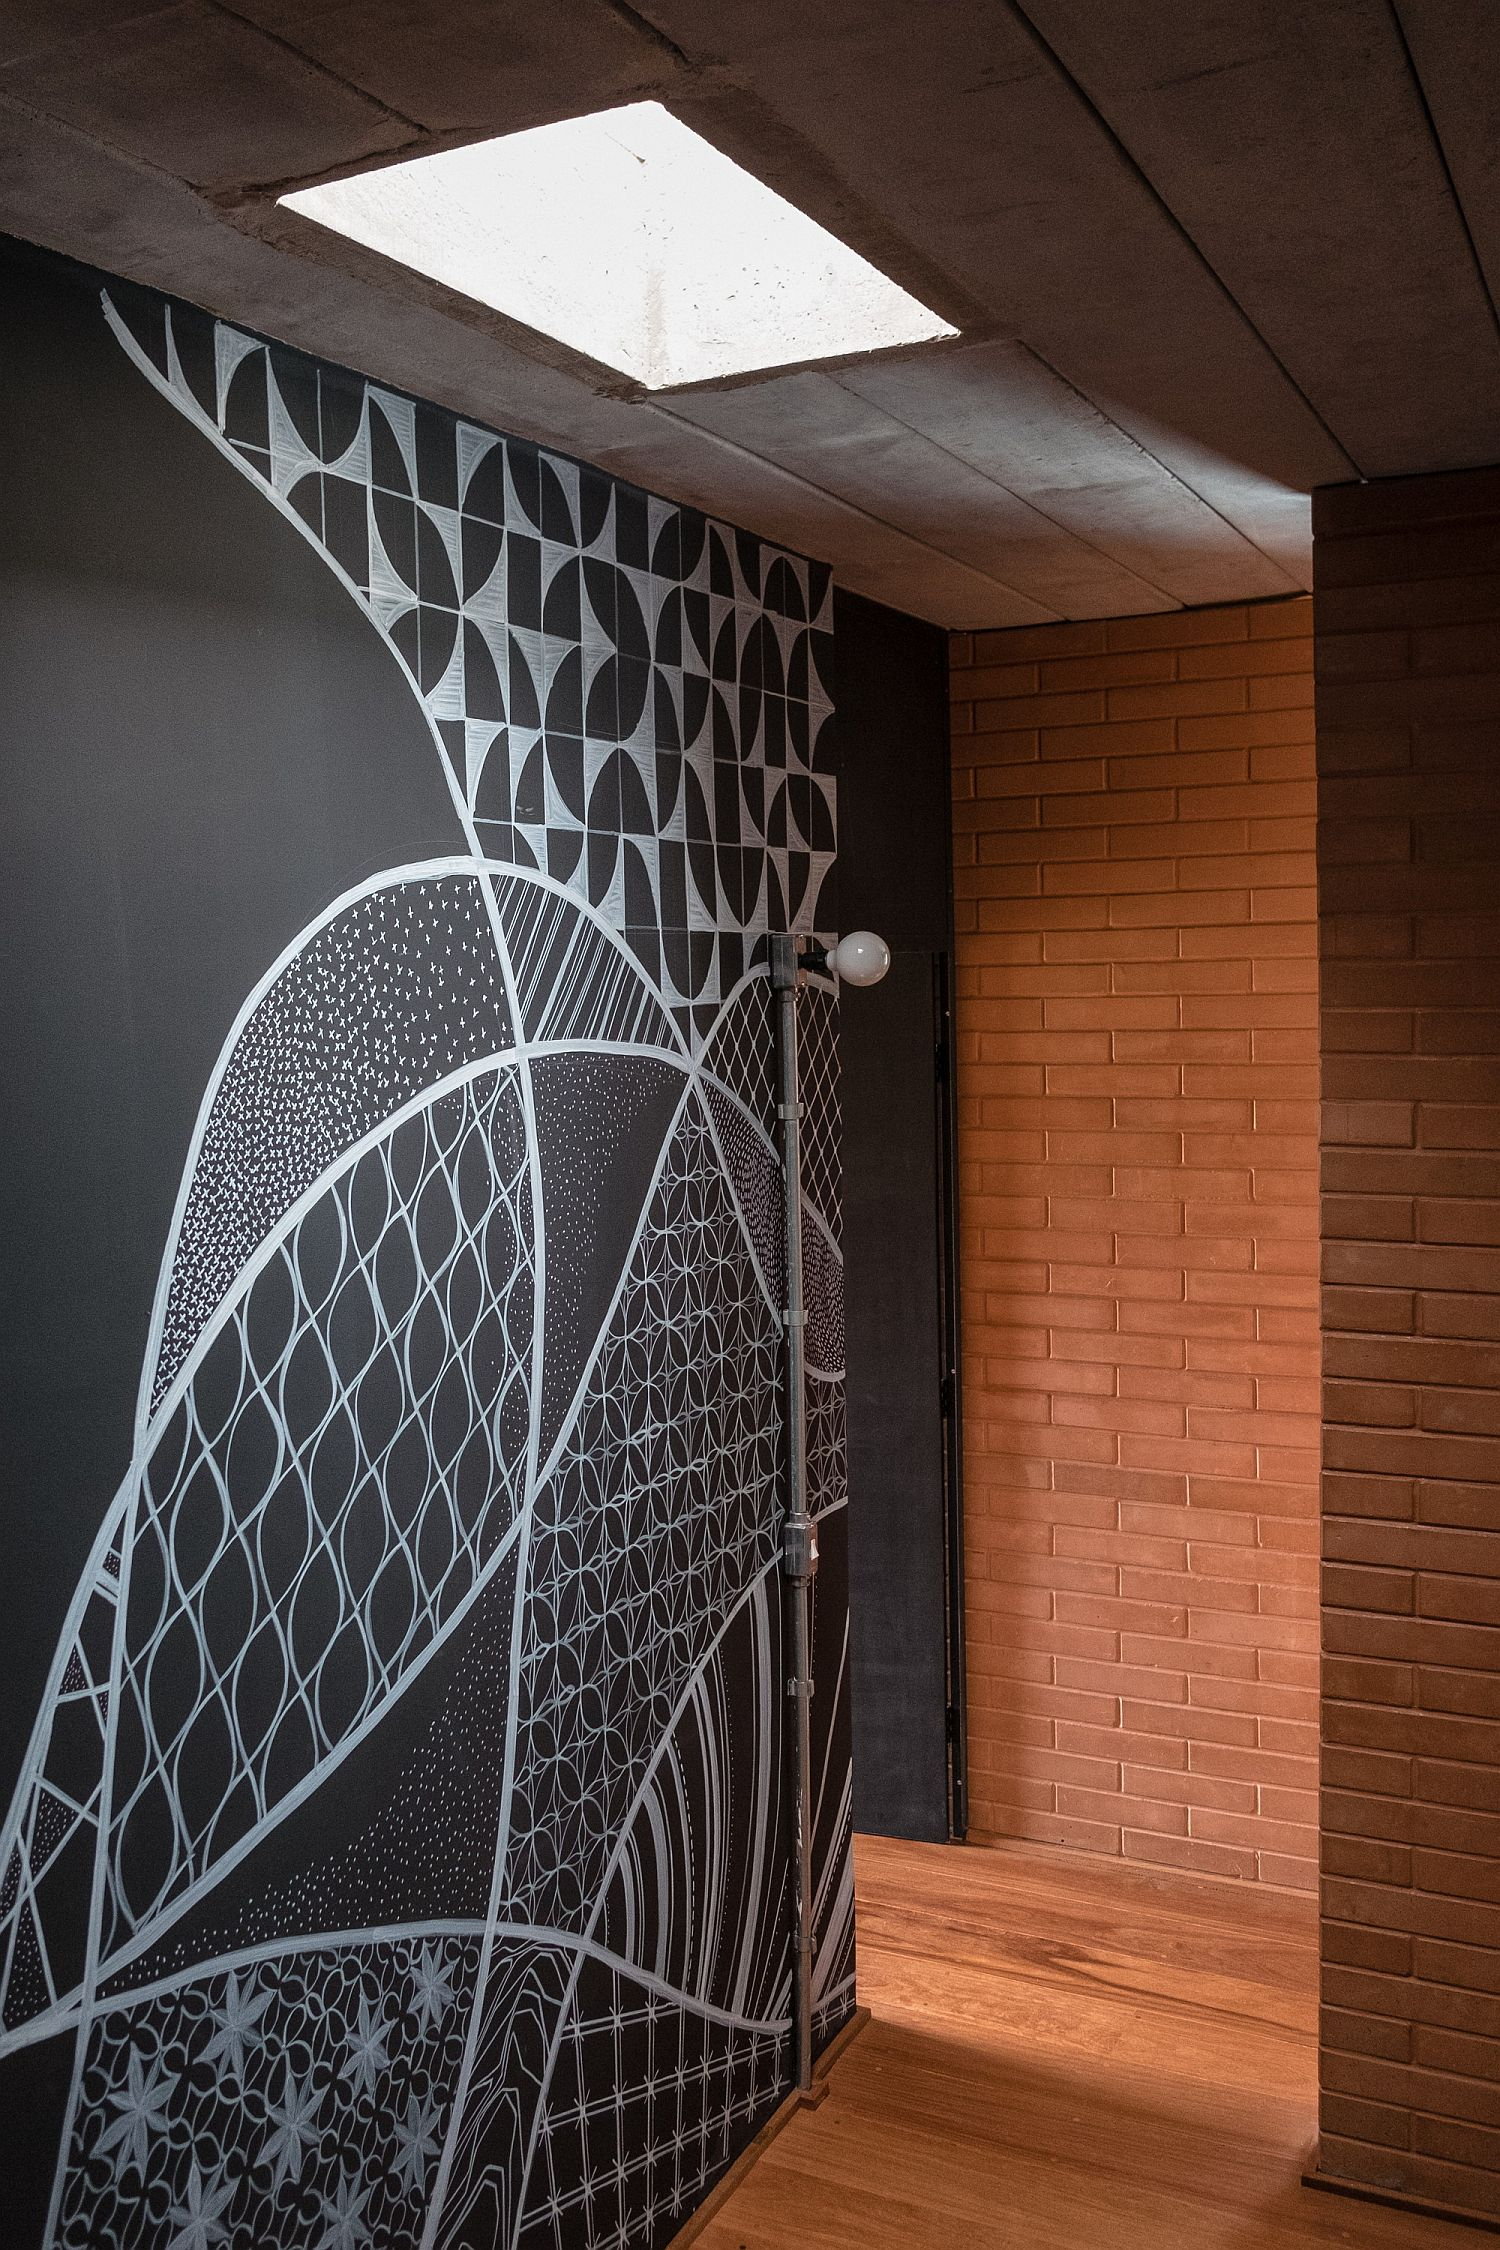 Skylight brings ventilation into the innovative Brazilian home